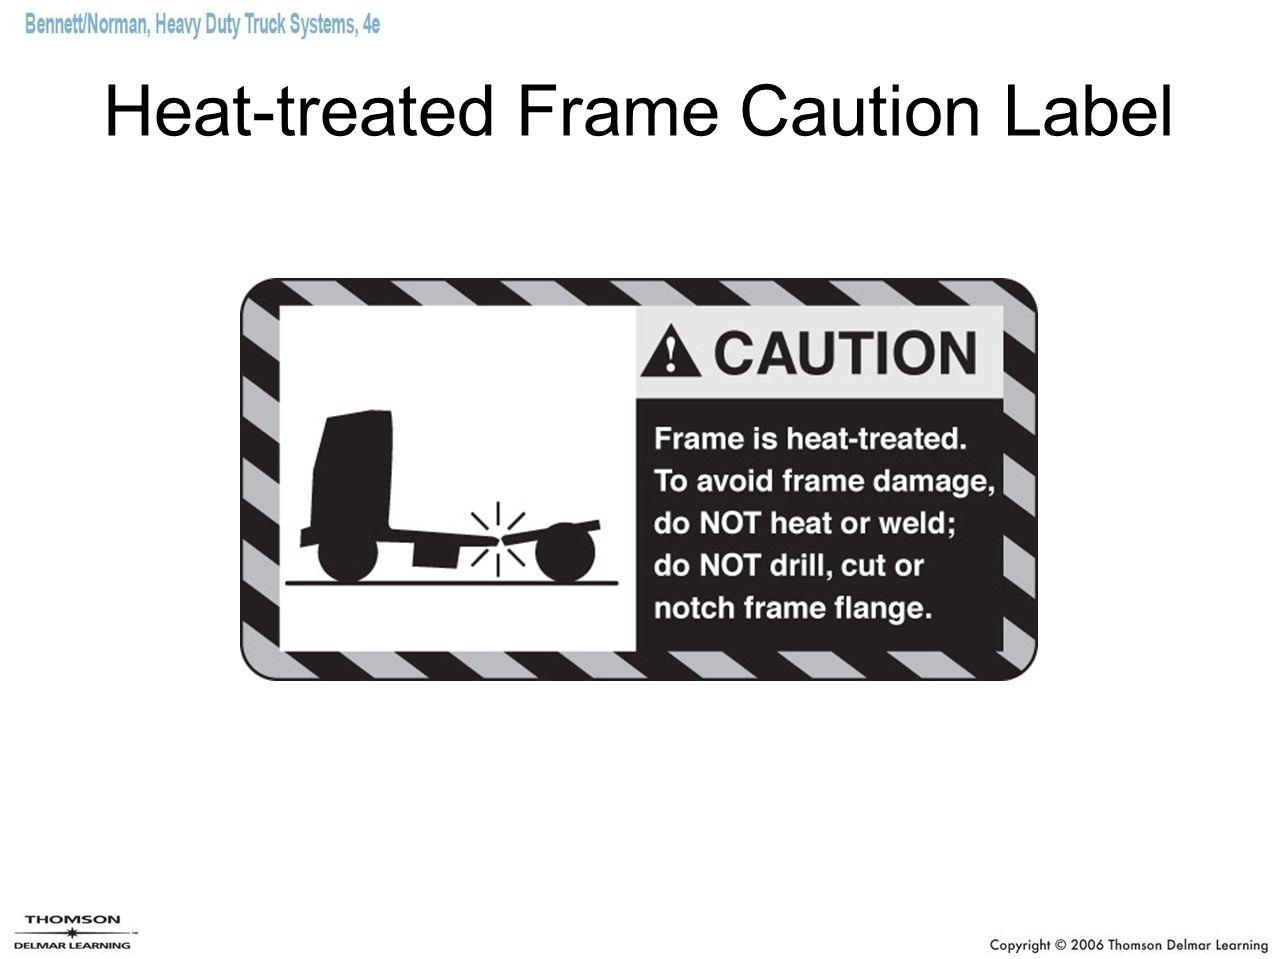 Heat-treated Frame Caution Label